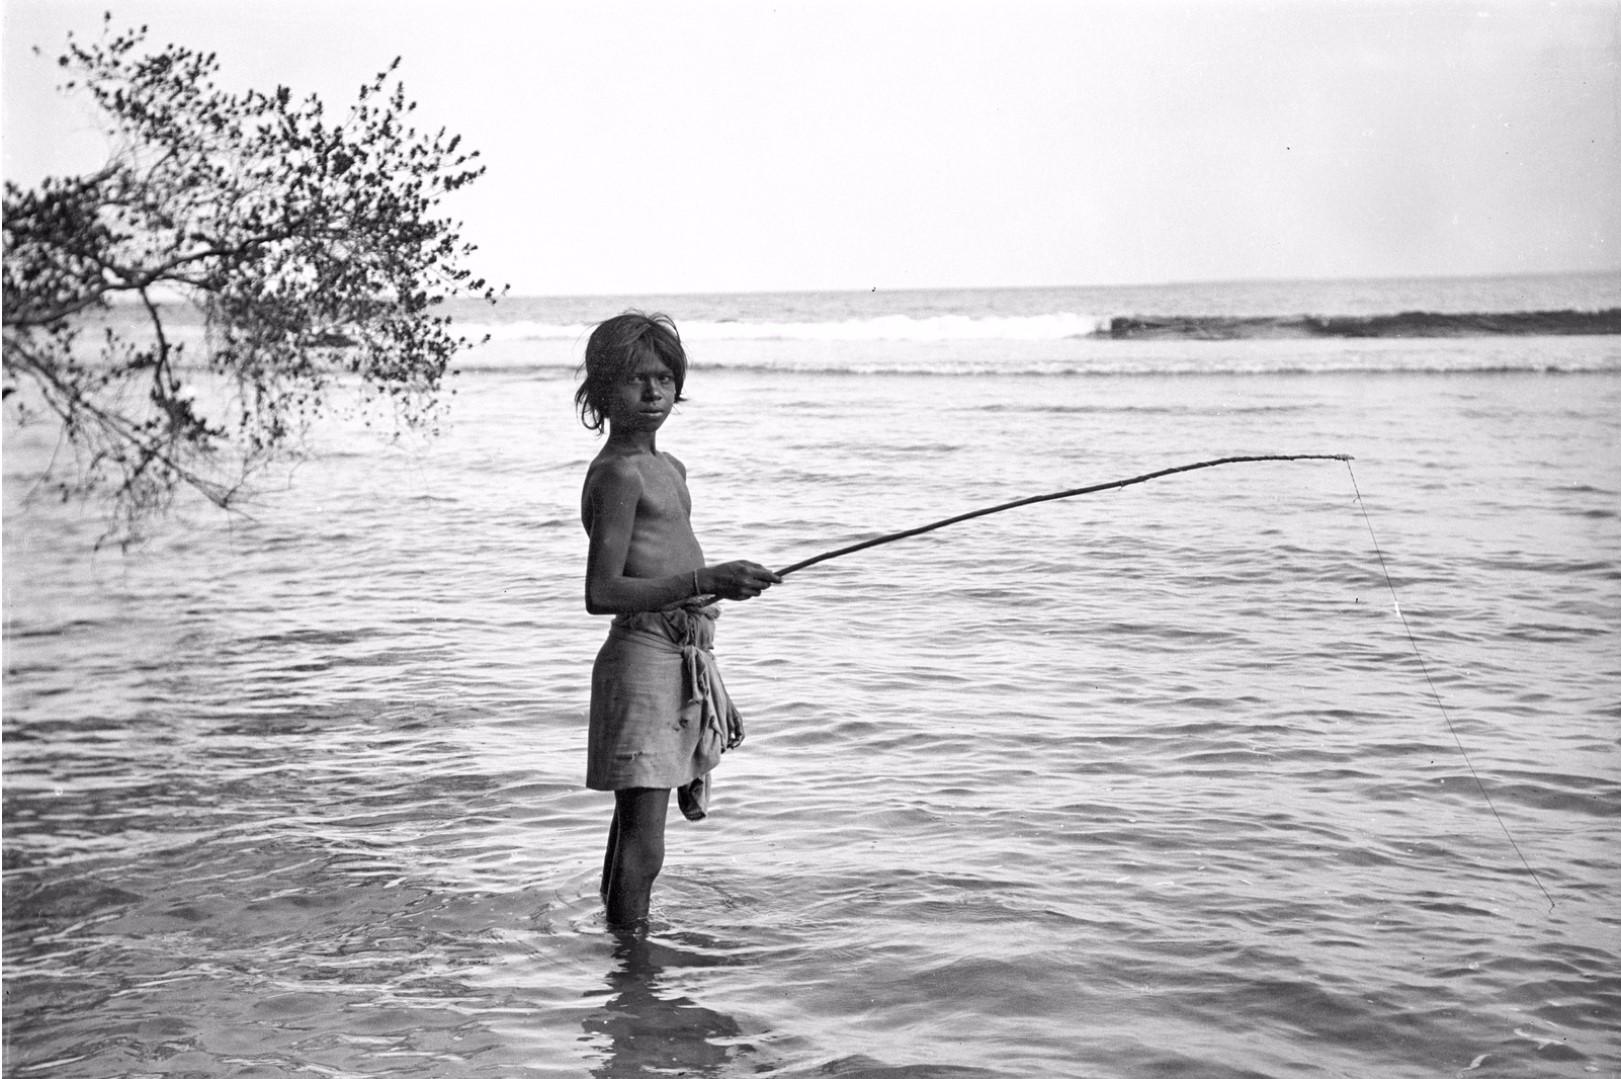 331. Калкуда. Мальчик ведд ловит рыбу